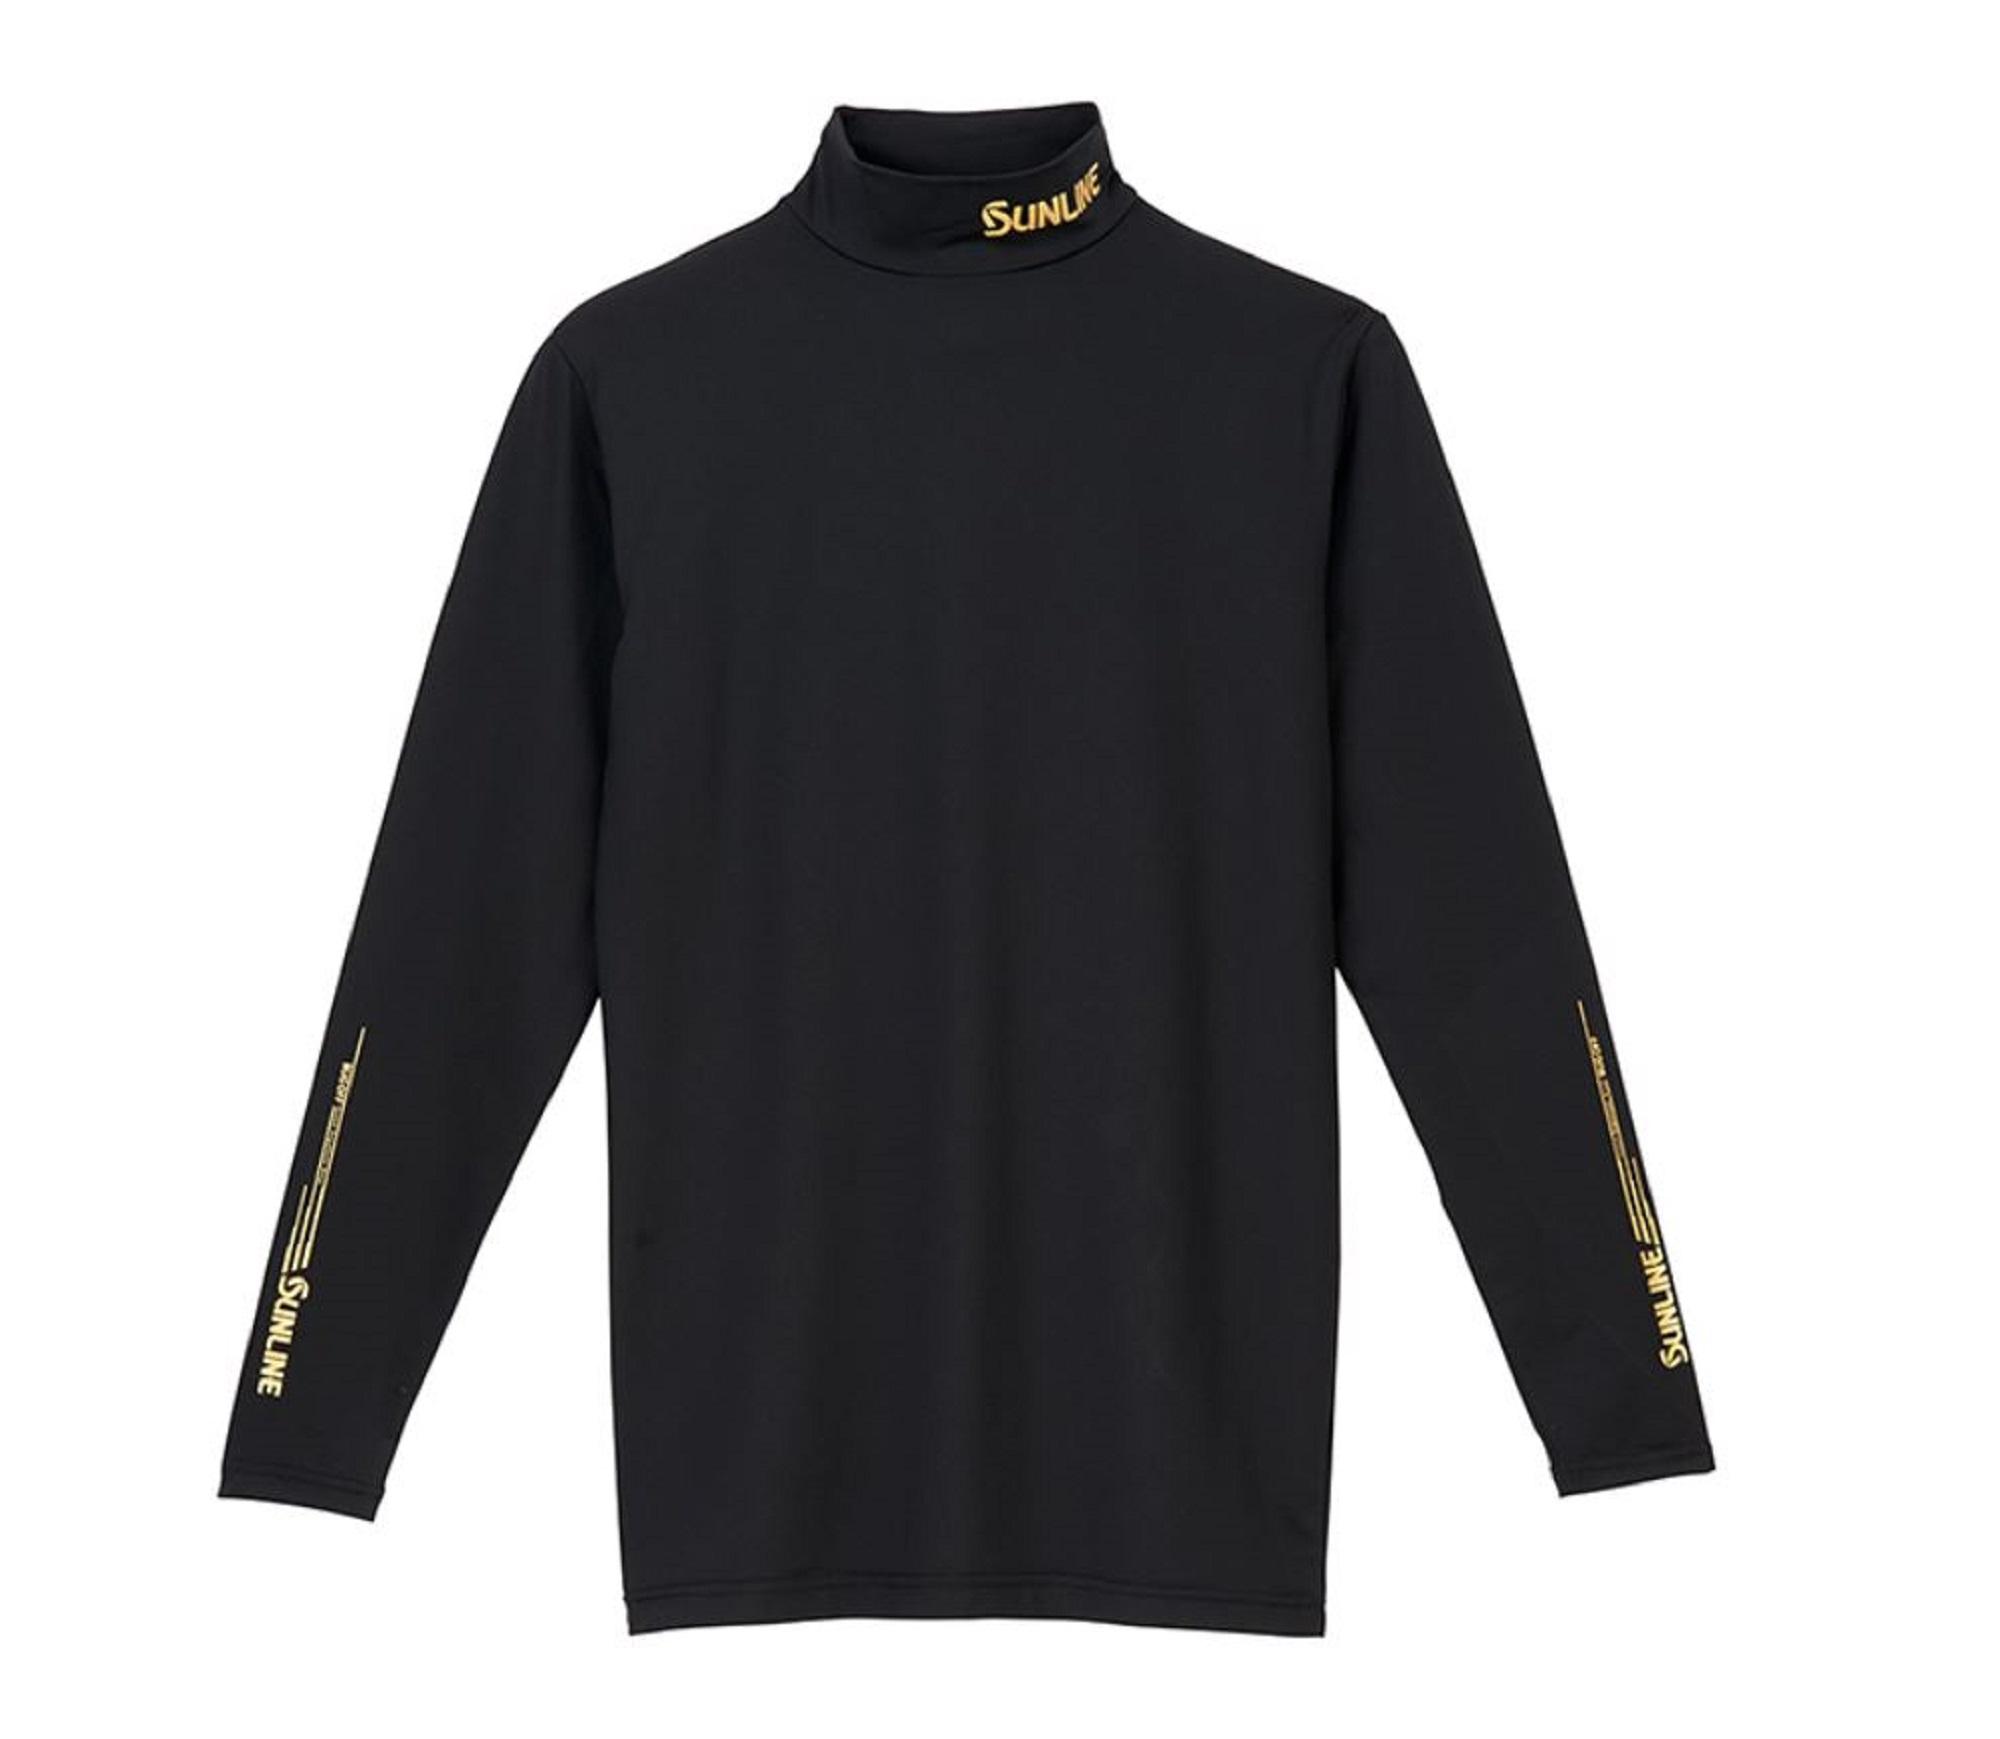 Sunline SUW-05505CW Undershirt Terax Cool Black Size XL (2494)